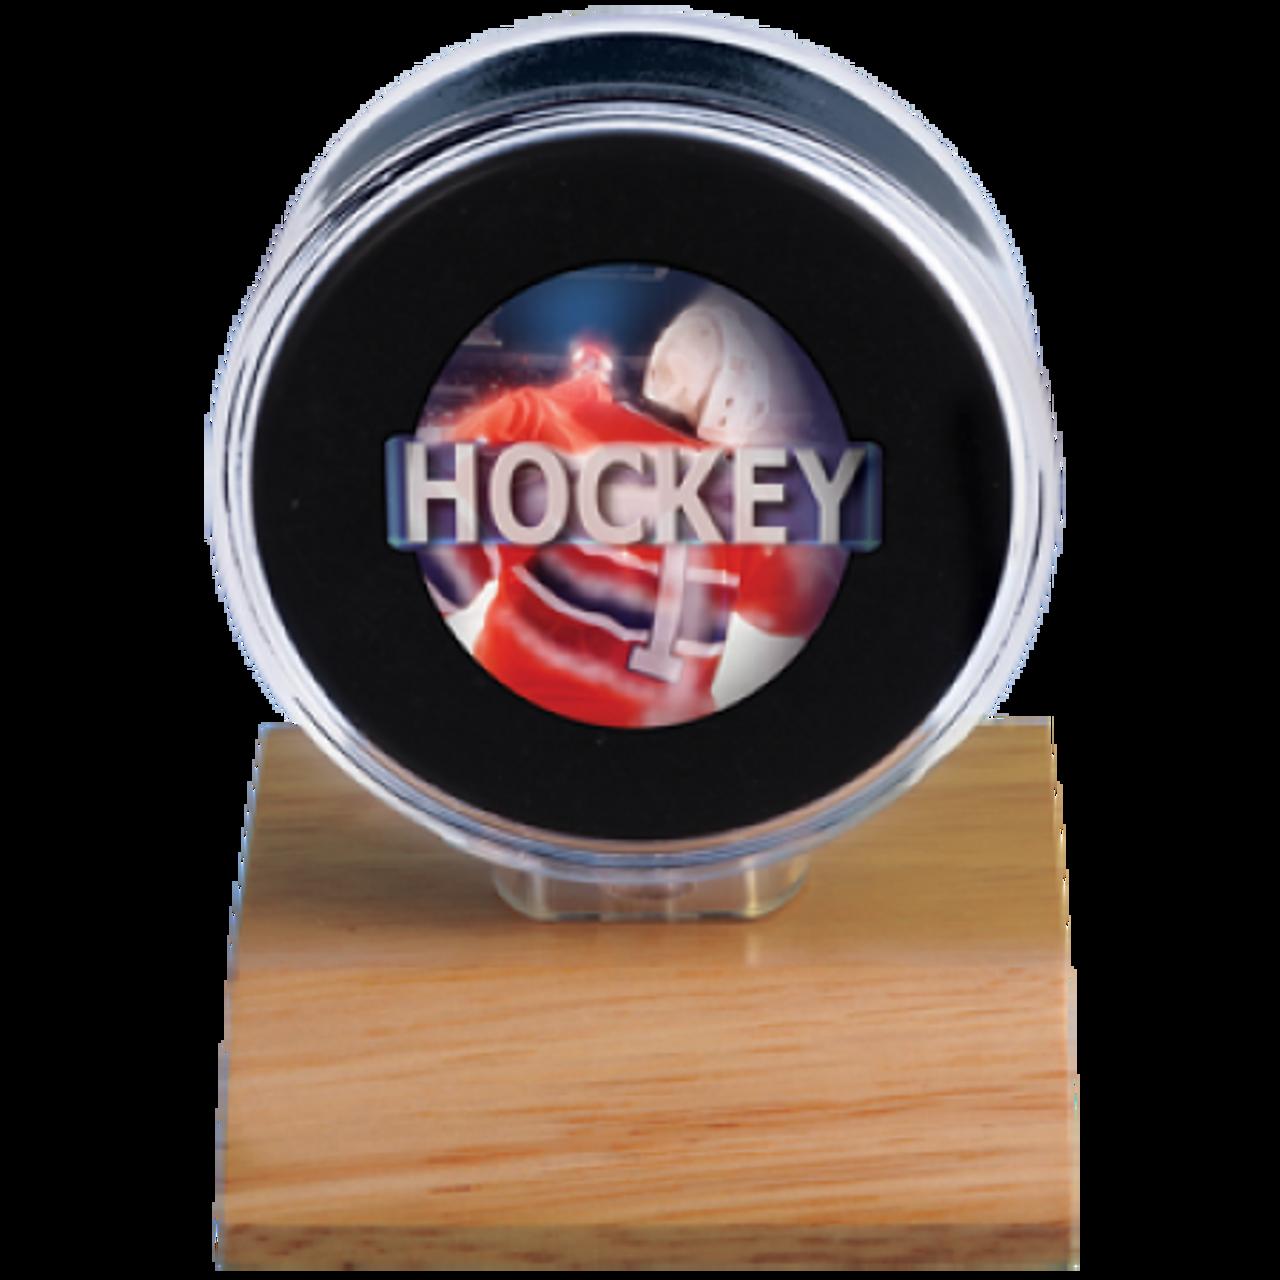 Hockey Puck Holder - Wood Base